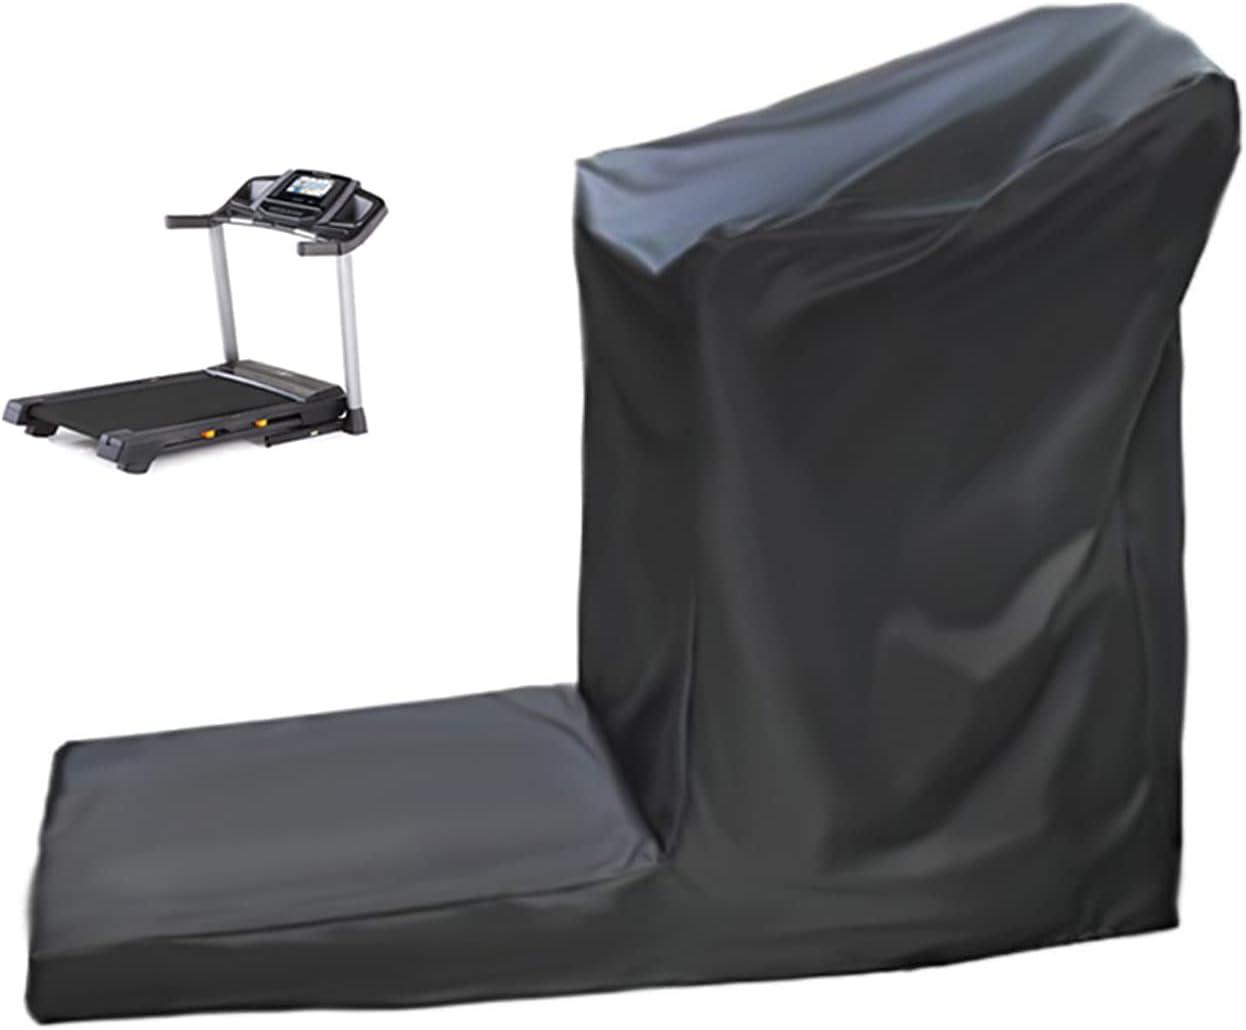 POMER Treadmill Cover - Waterproof Max 49% OFF Equipment Pr Dustproof Cardio Ranking TOP17